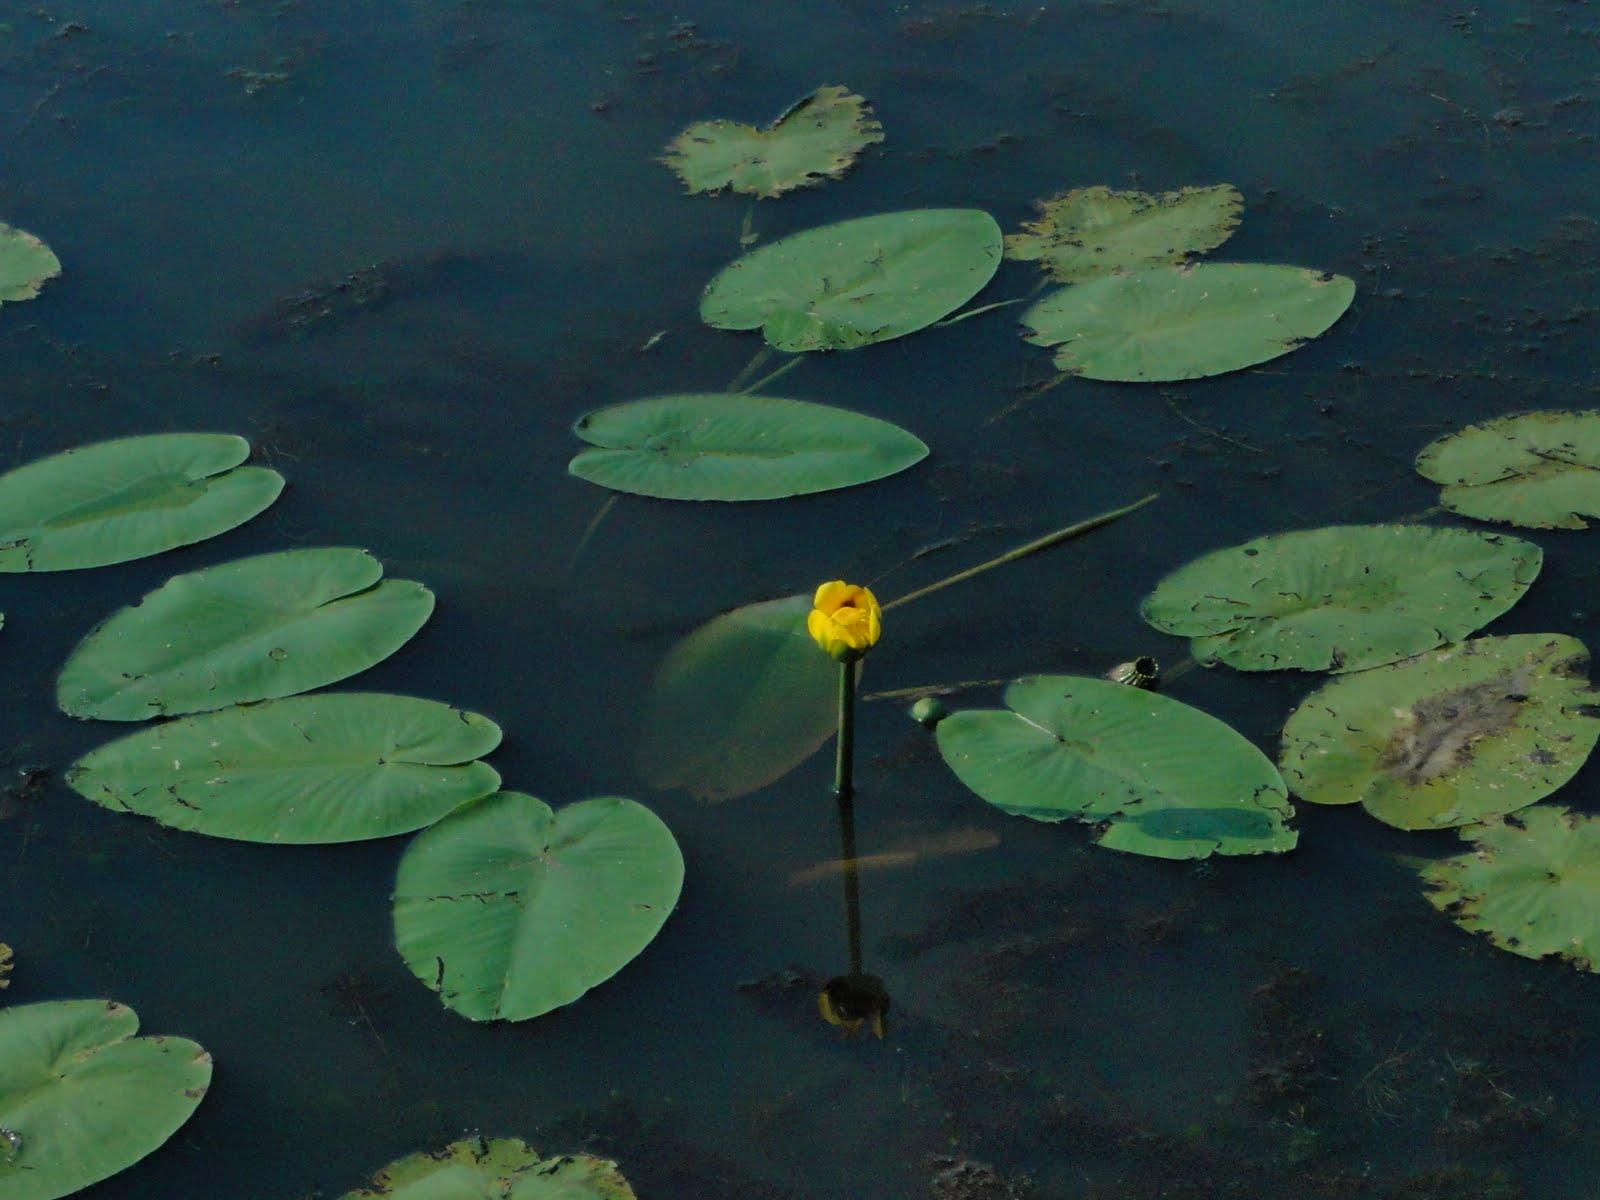 Rachs wildflower images spadderdock yellow pond lily yellow cow spadderdock yellow pond lily yellow cow lily bullhead lily izmirmasajfo